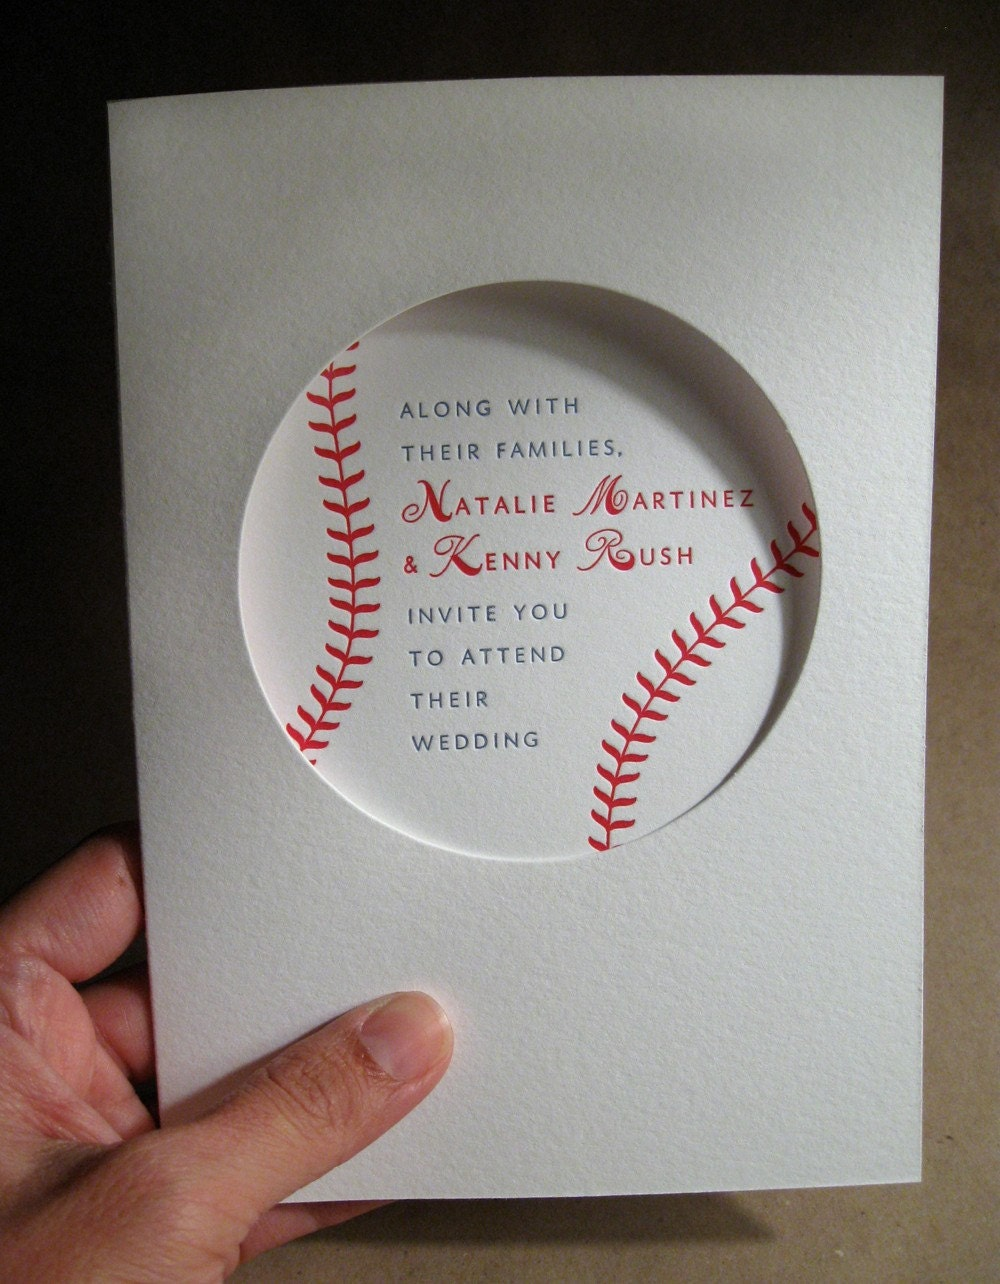 Cute Bridal Shower Invitation Wording is great invitations ideas